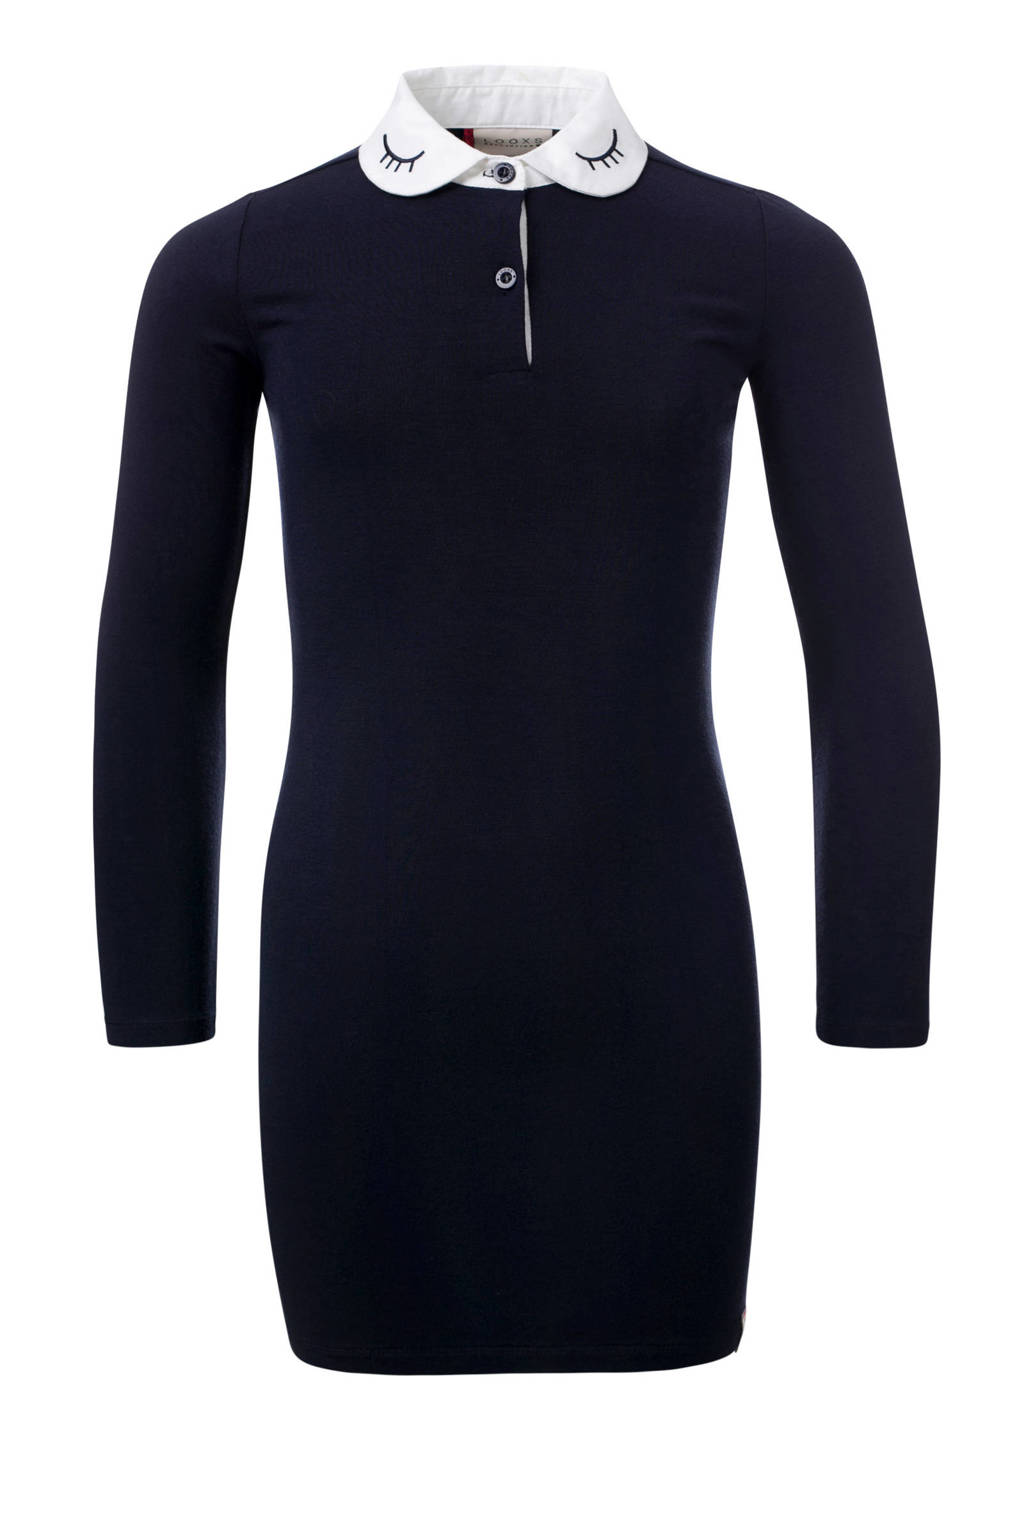 LOOXS 10sixteen jurk donkerblauw, Donkerblauw